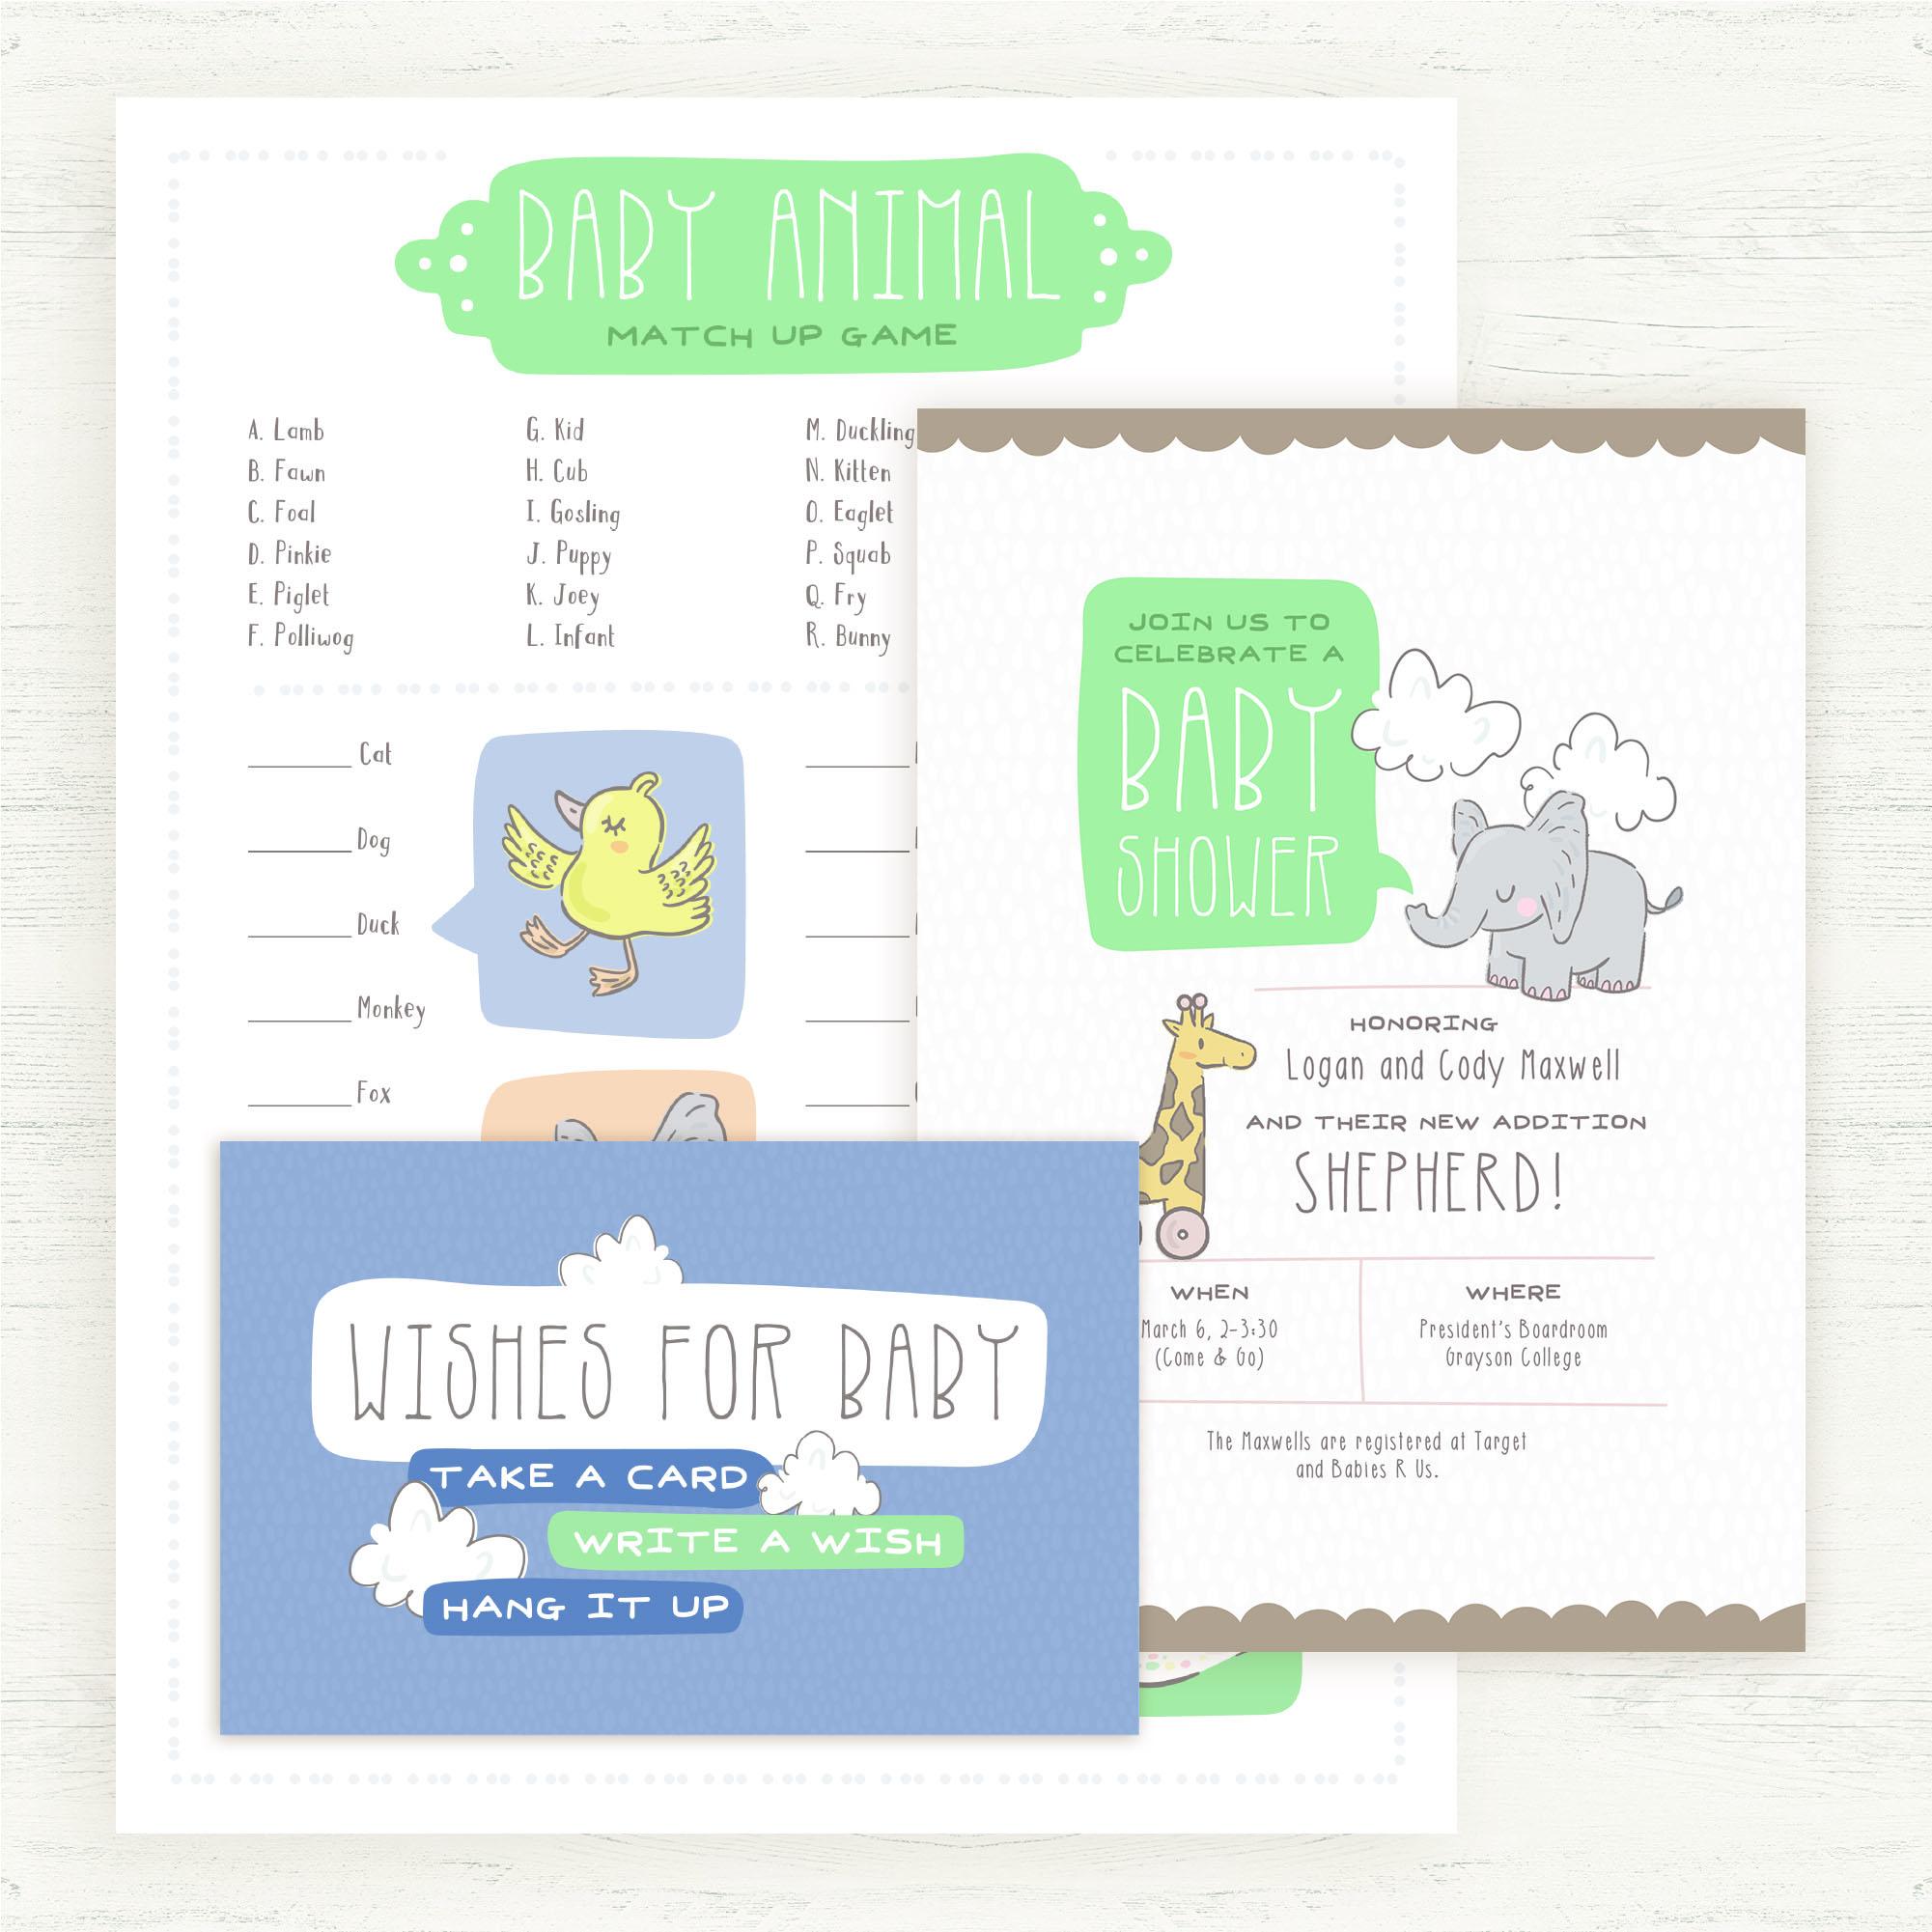 Events and Wedding Invitations RSVP Wedding Website